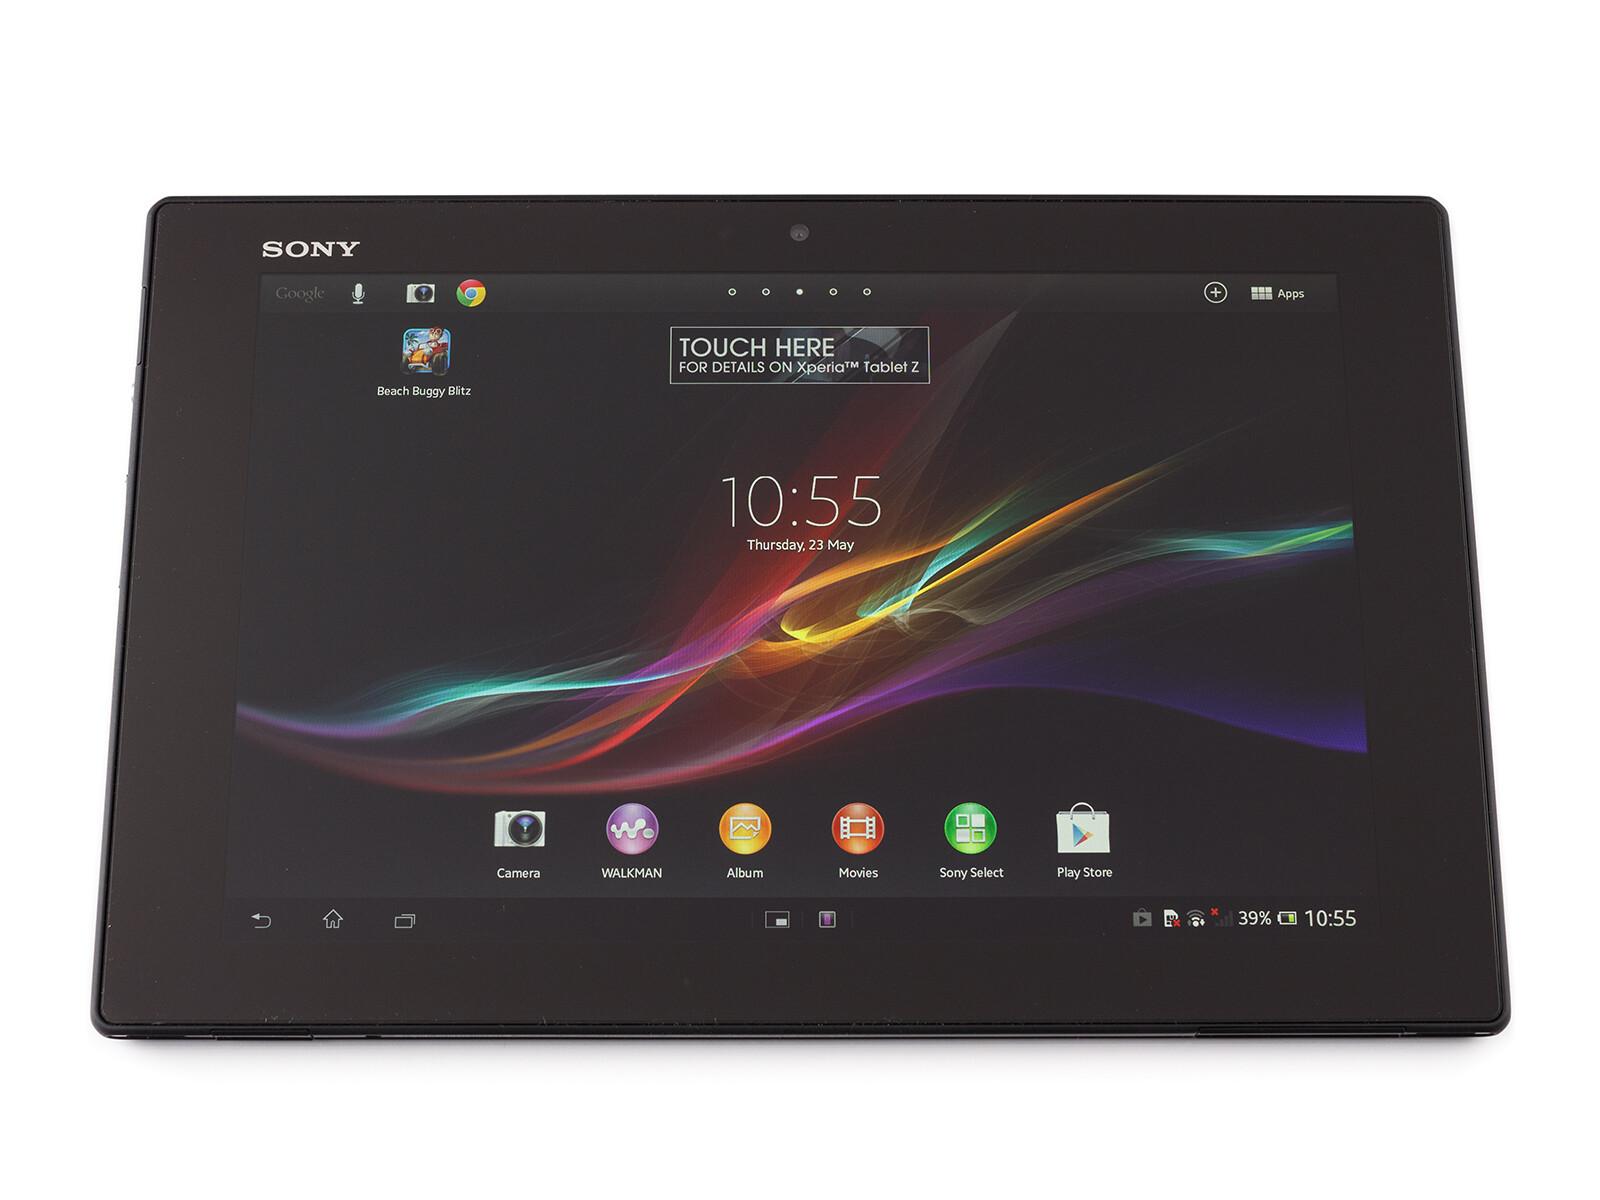 Sony Xperia Tablet Z specs